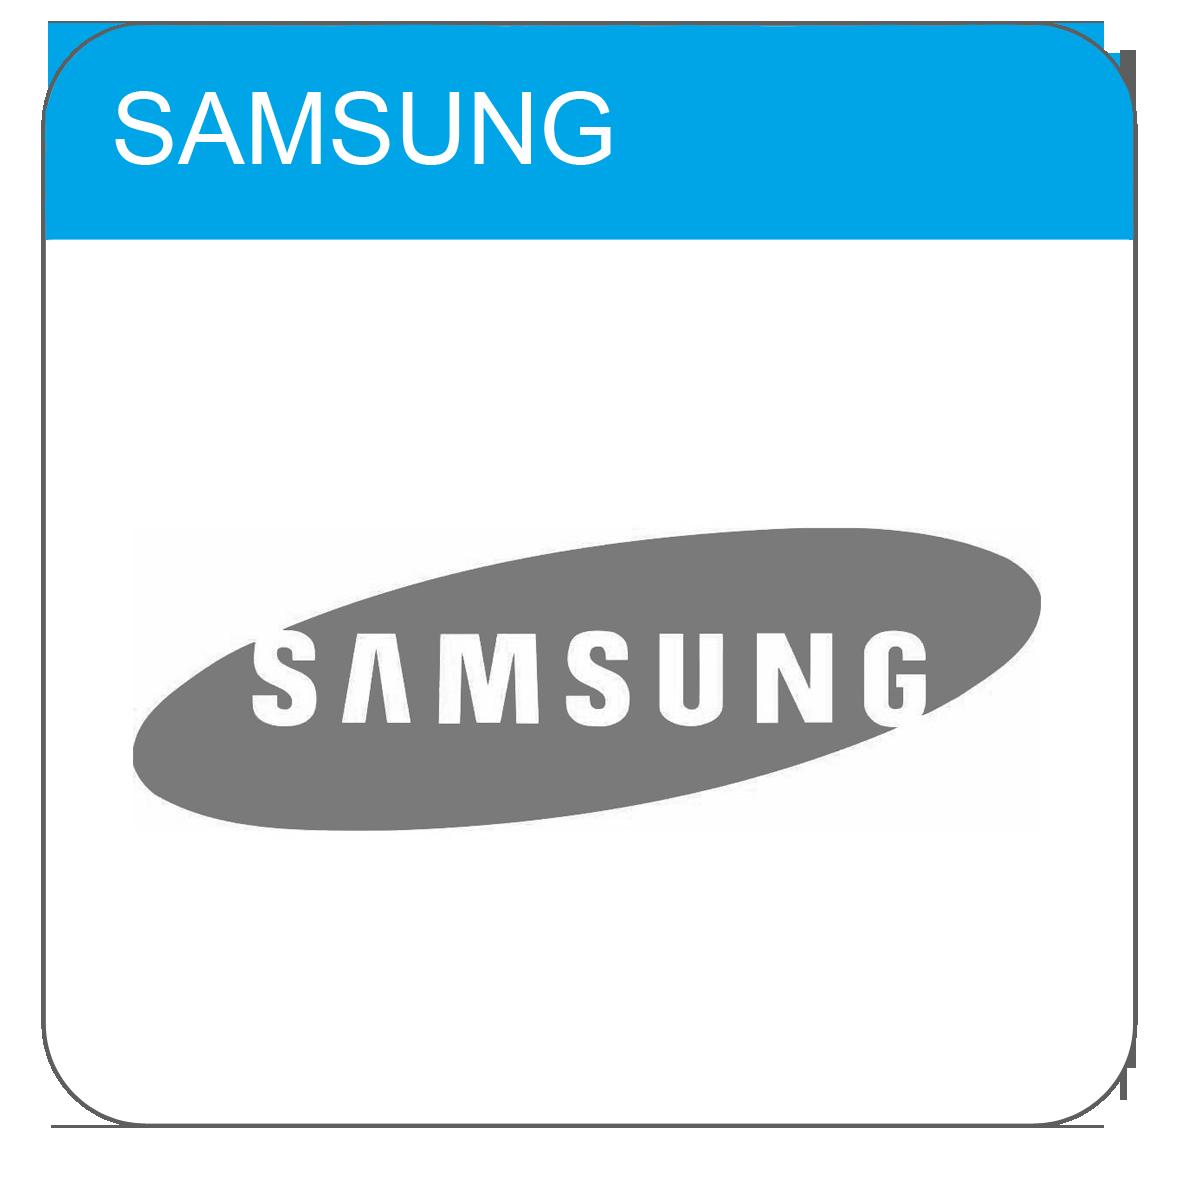 Samsung Drivers & Handleidingen